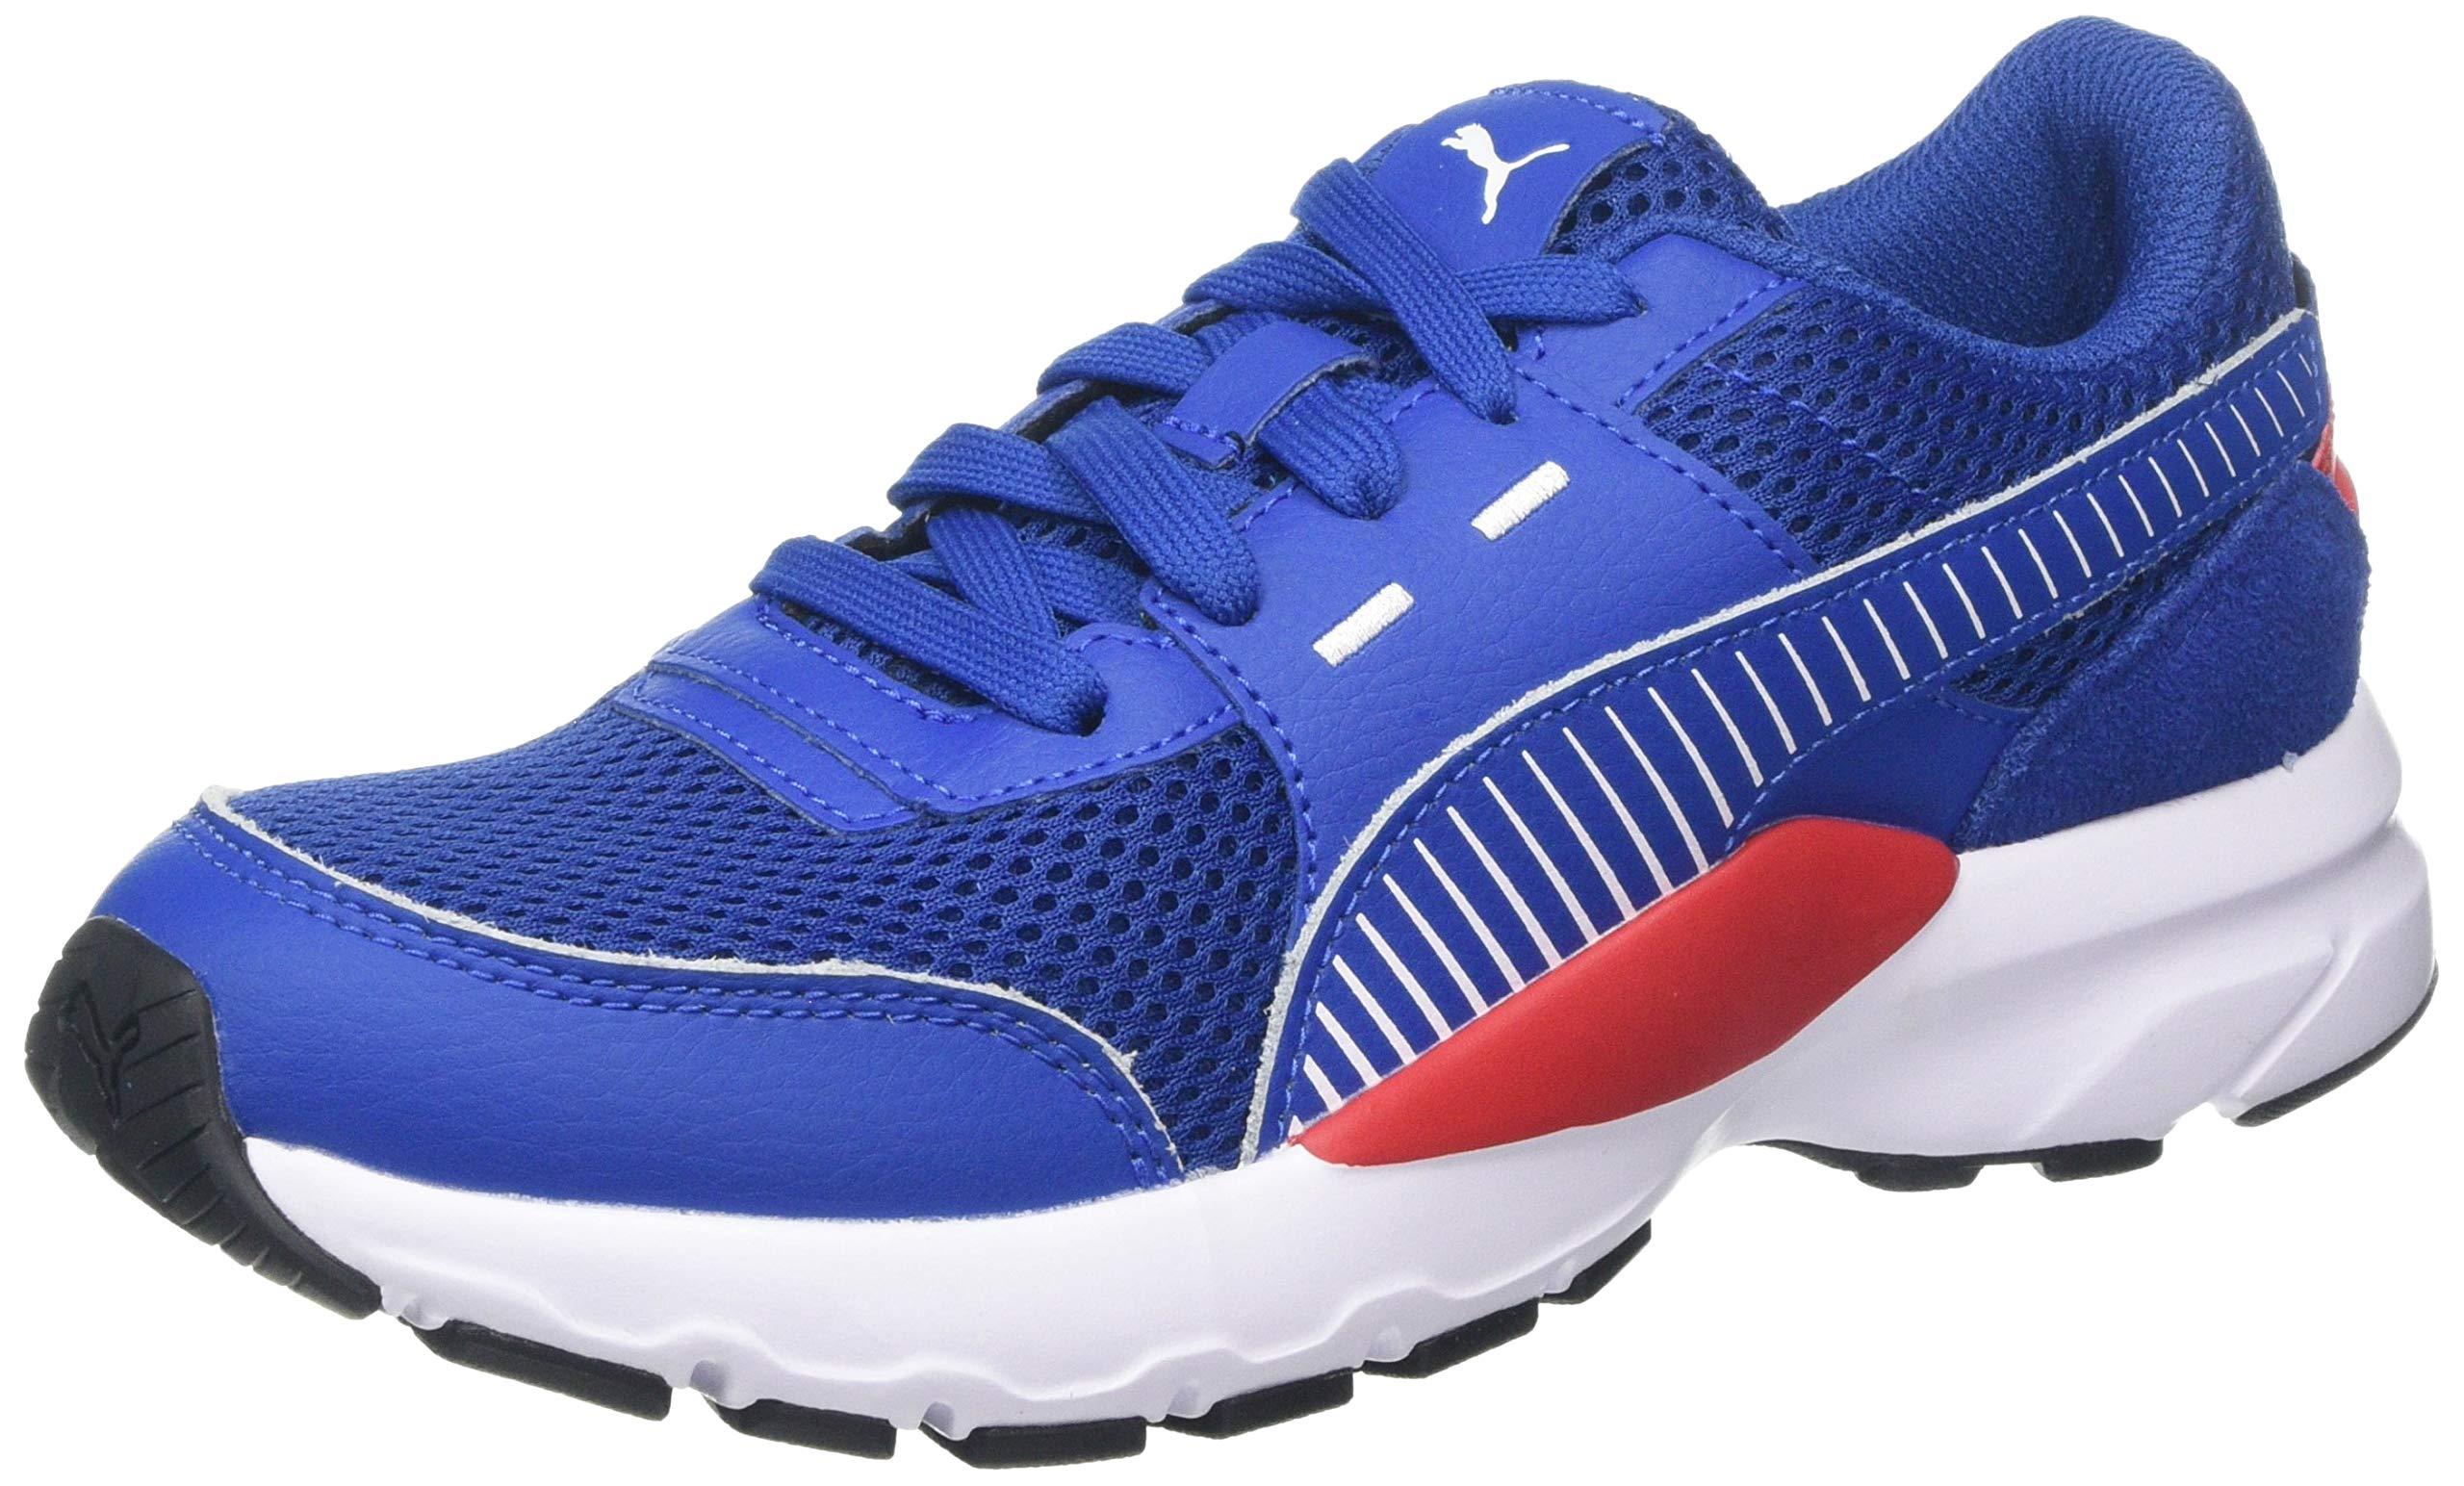 0645 Future PremiumBaskets Mixte Blue White Risk Red high Runner Eu puma AdulteBleugalaxy Black Puma puma bvY7gyf6